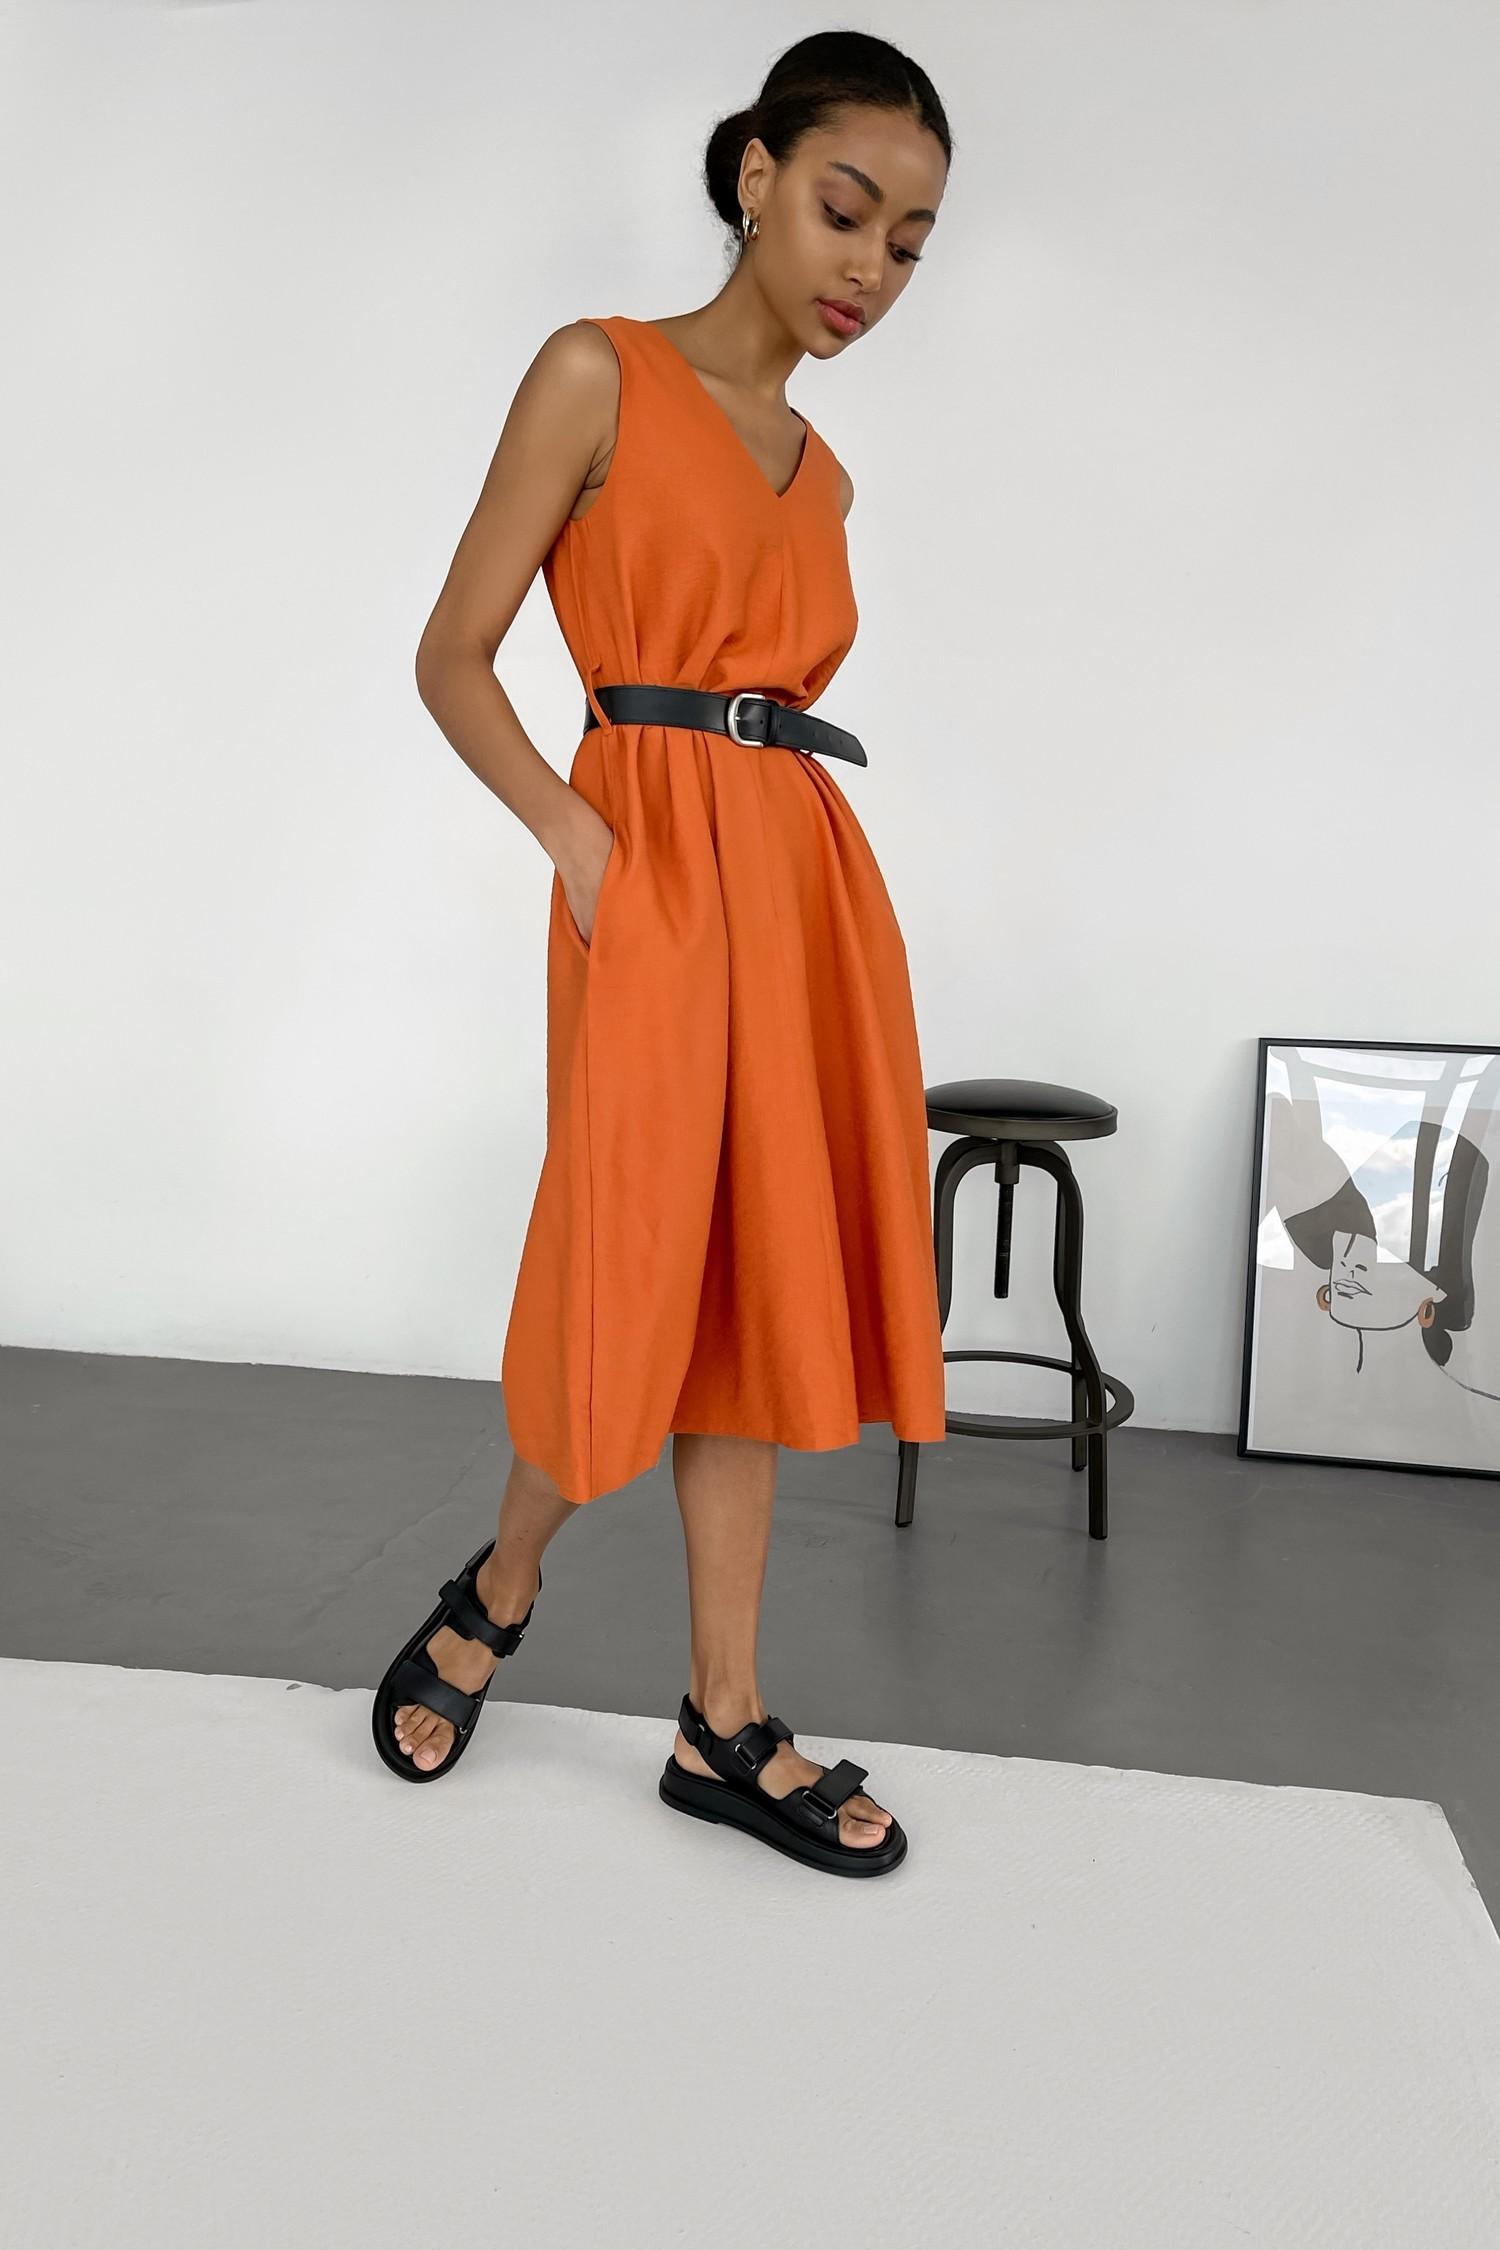 Сарафан с вырезом оранжевый - THE LACE